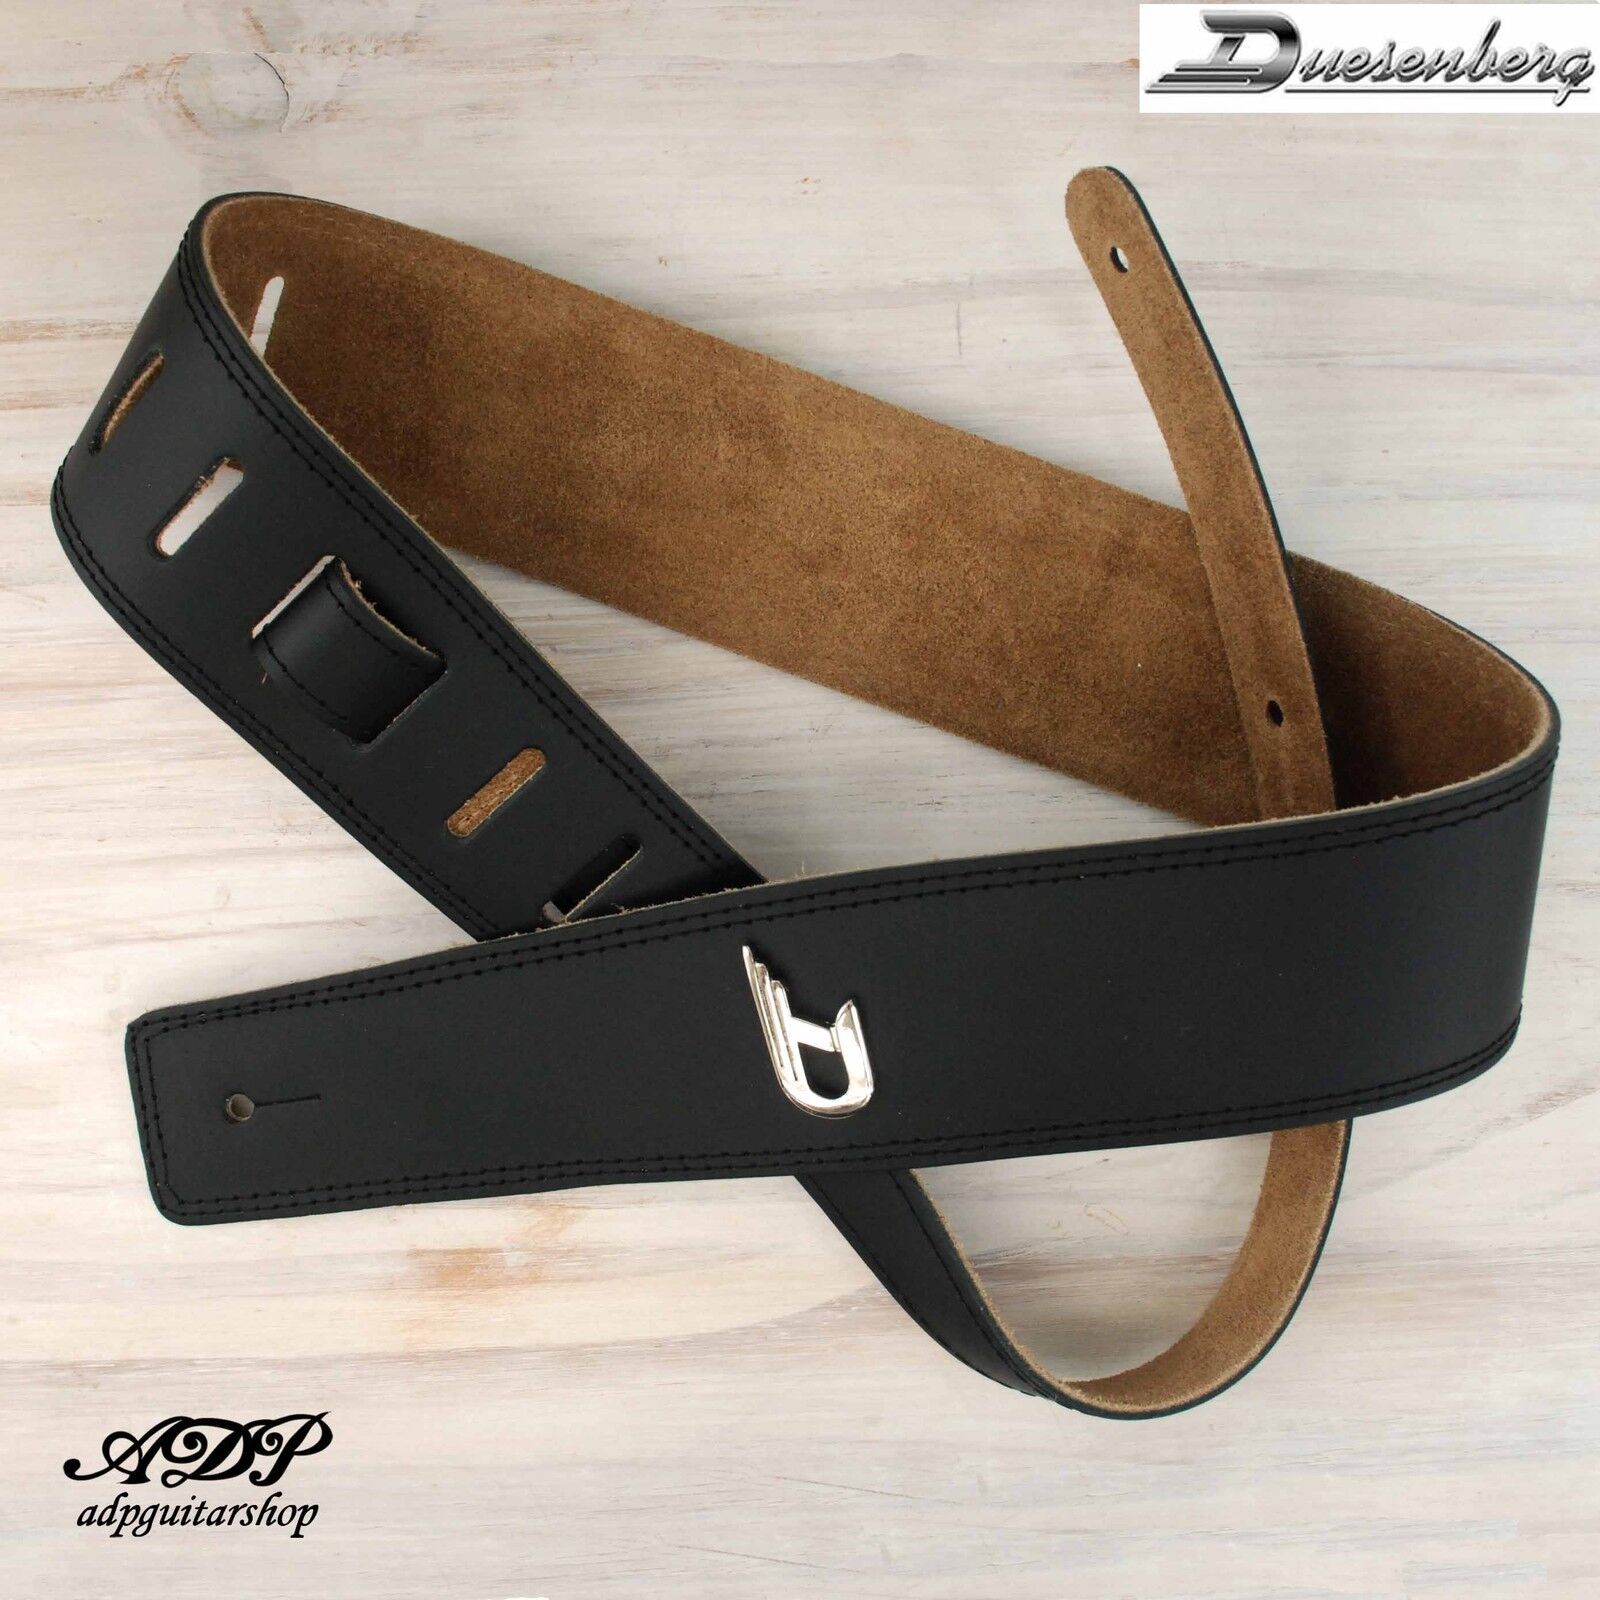 Sangle Courroie cuir schwarz Duesenberg Guitare ou Basse Dchrom 160cm Leather Strap